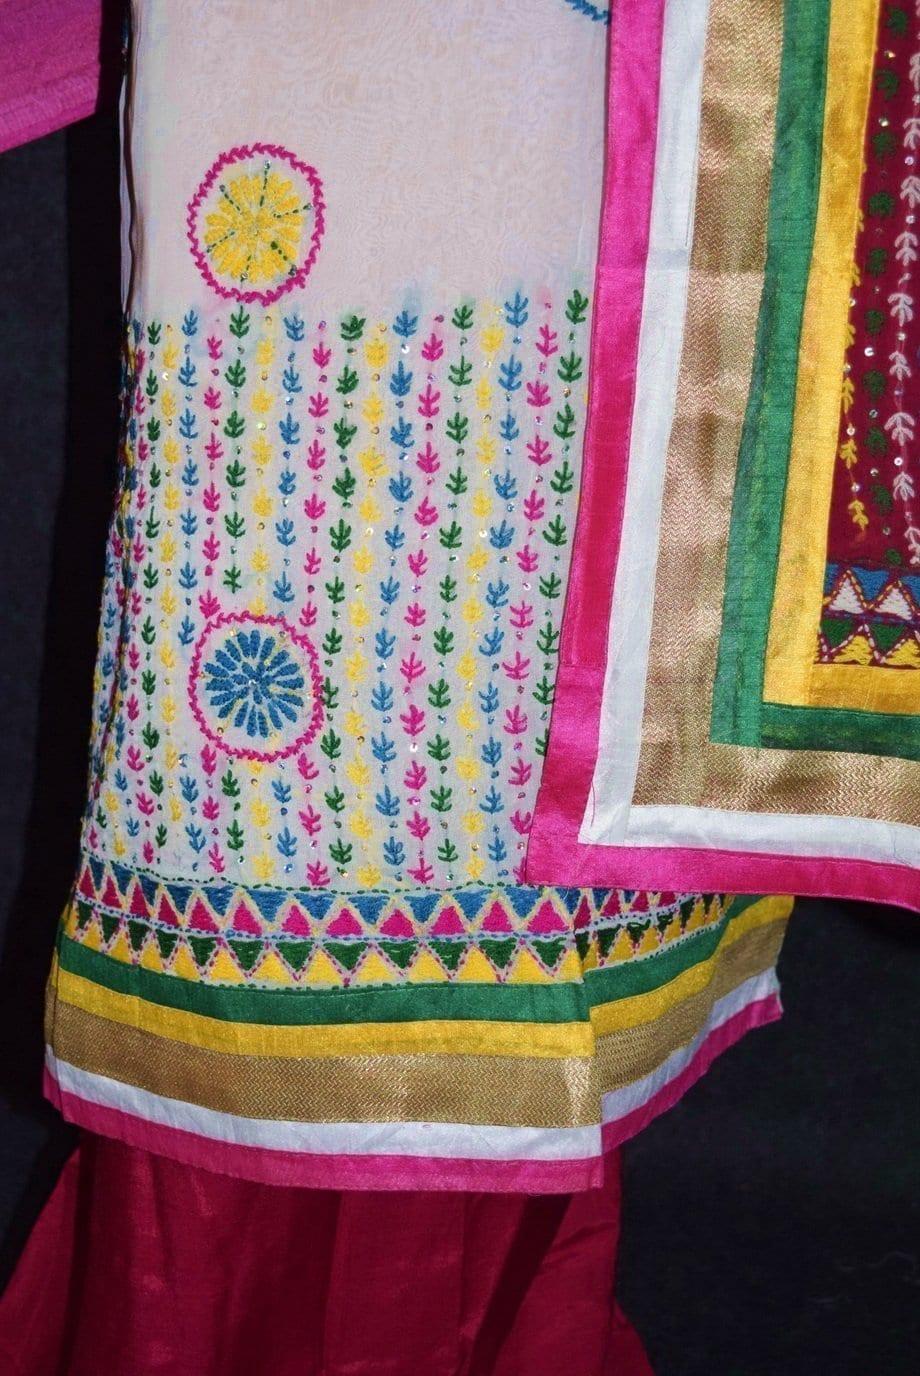 Party Wear Georgette hand Embroidered Salwar kameez stole suit set F0657 4